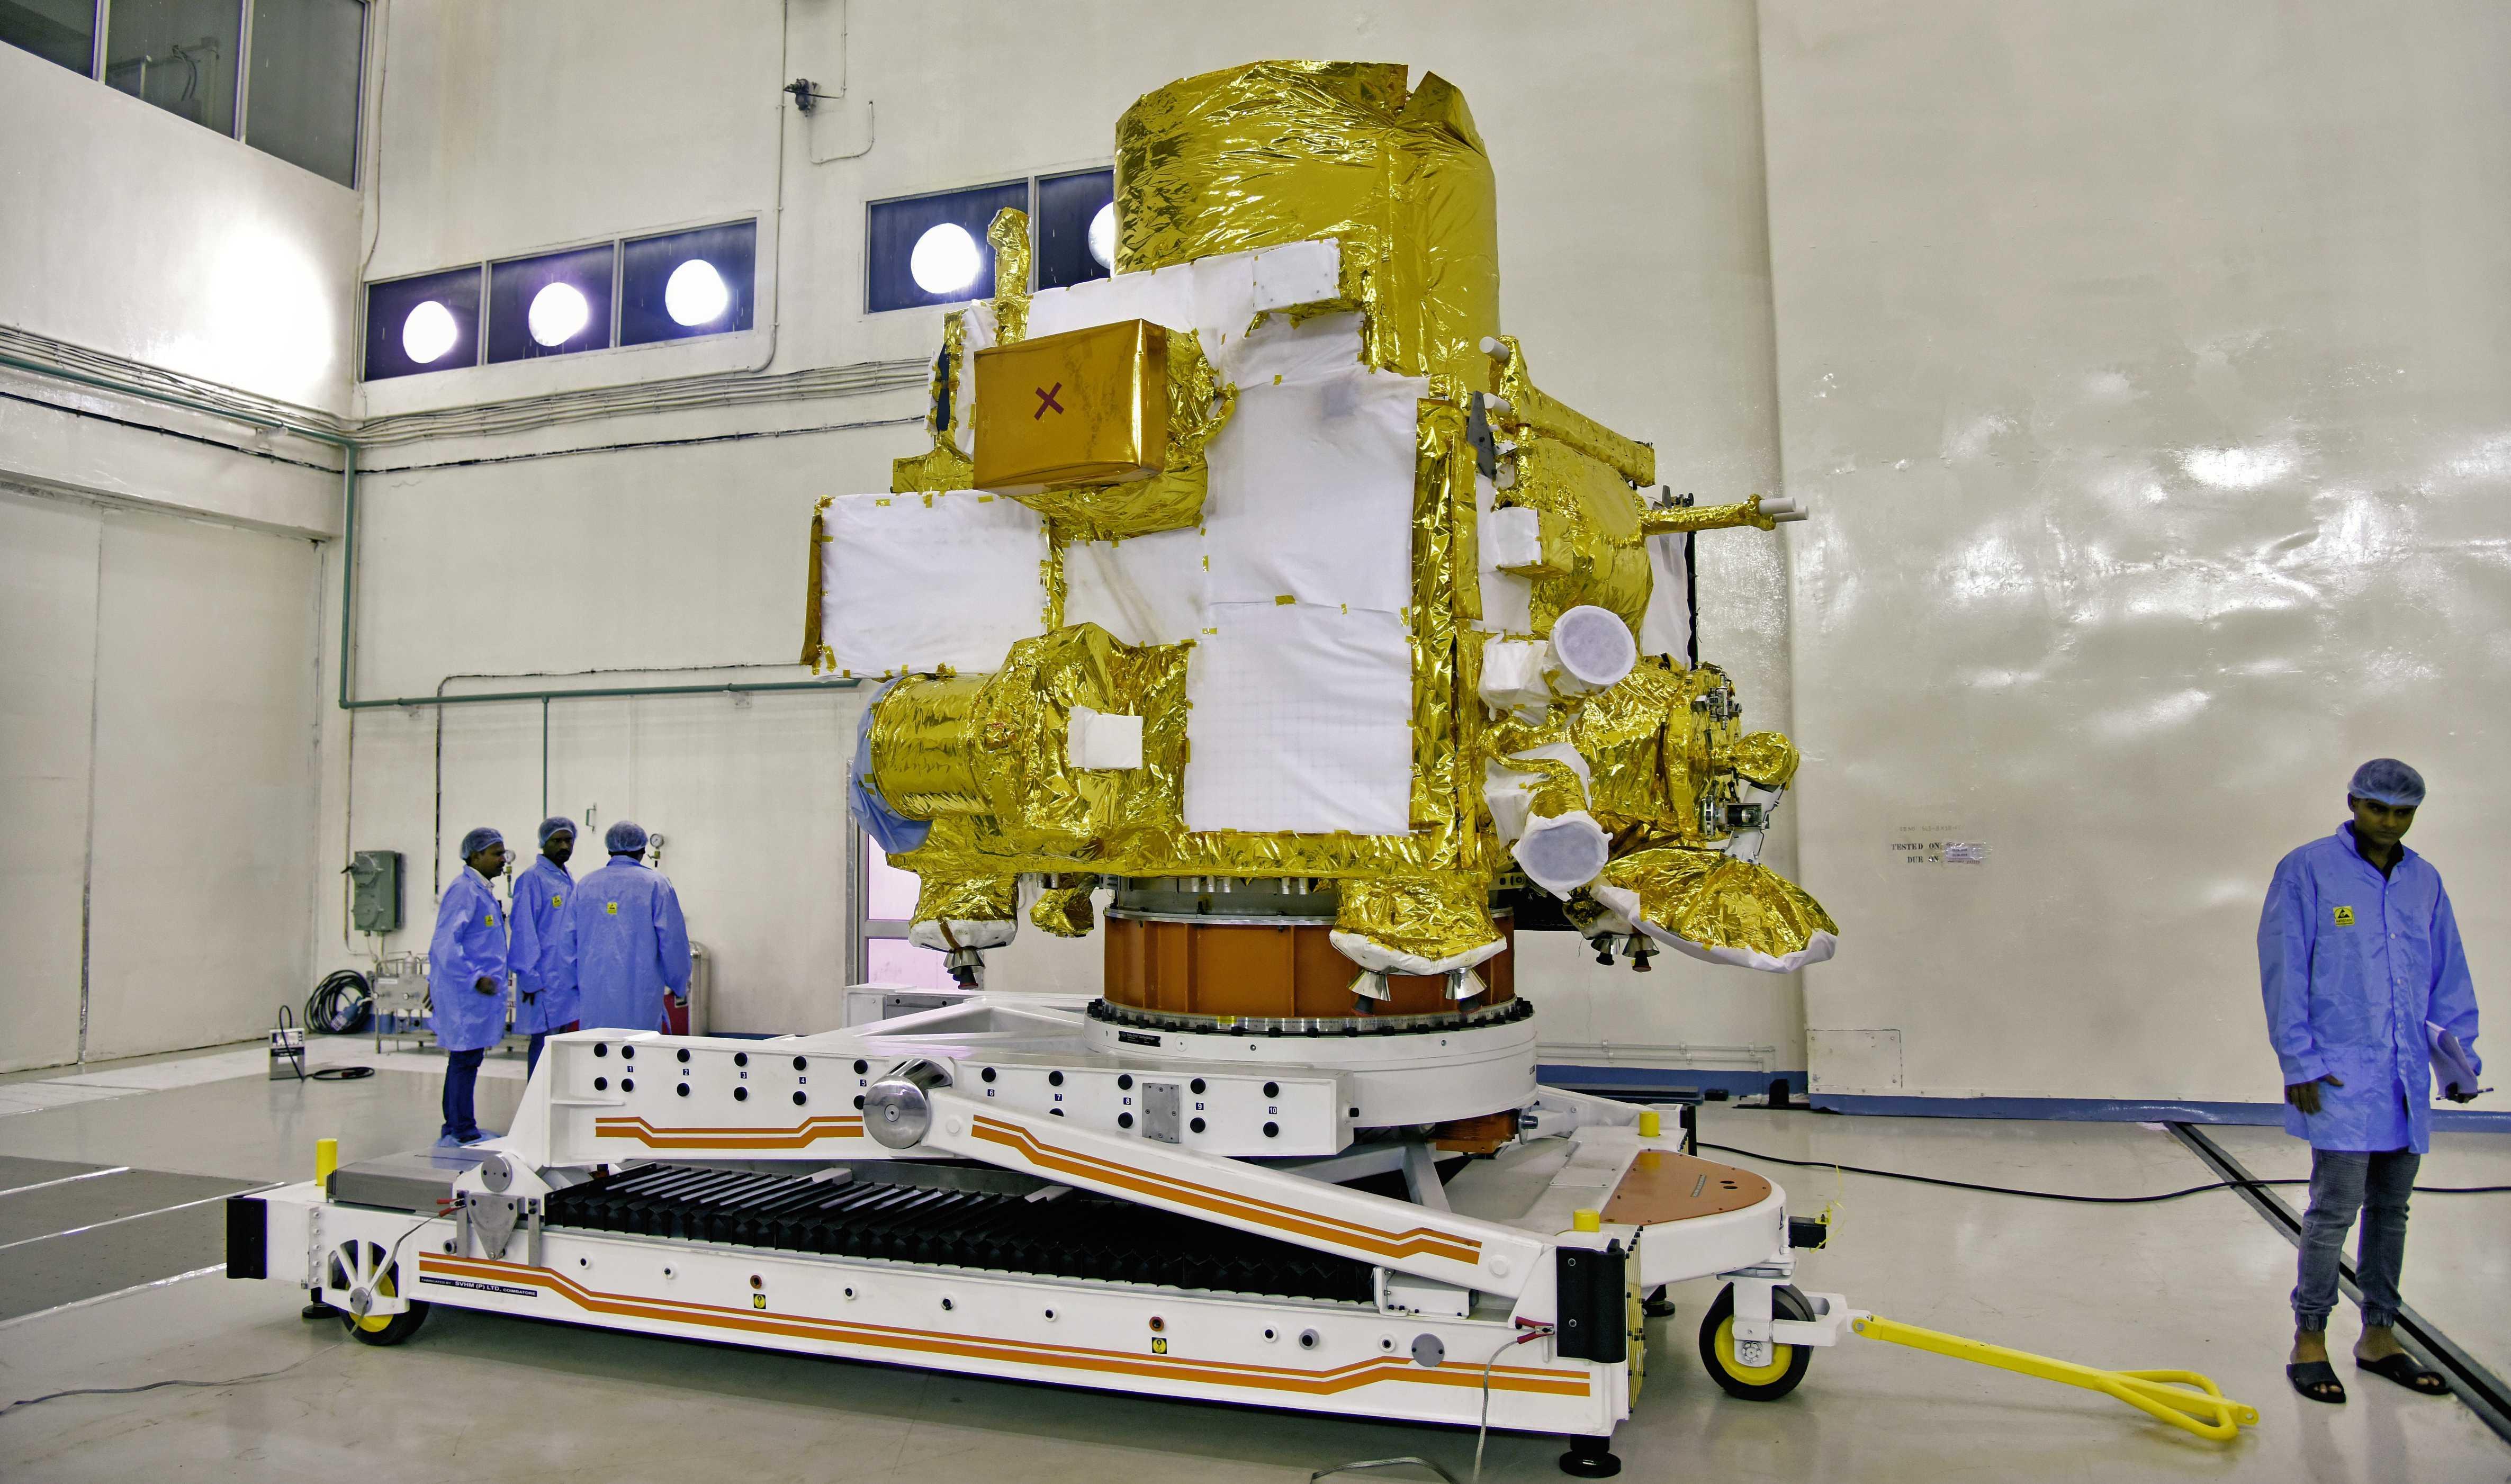 Chandrayaan-2 lunar orbiter (ISRO) 2 (c)